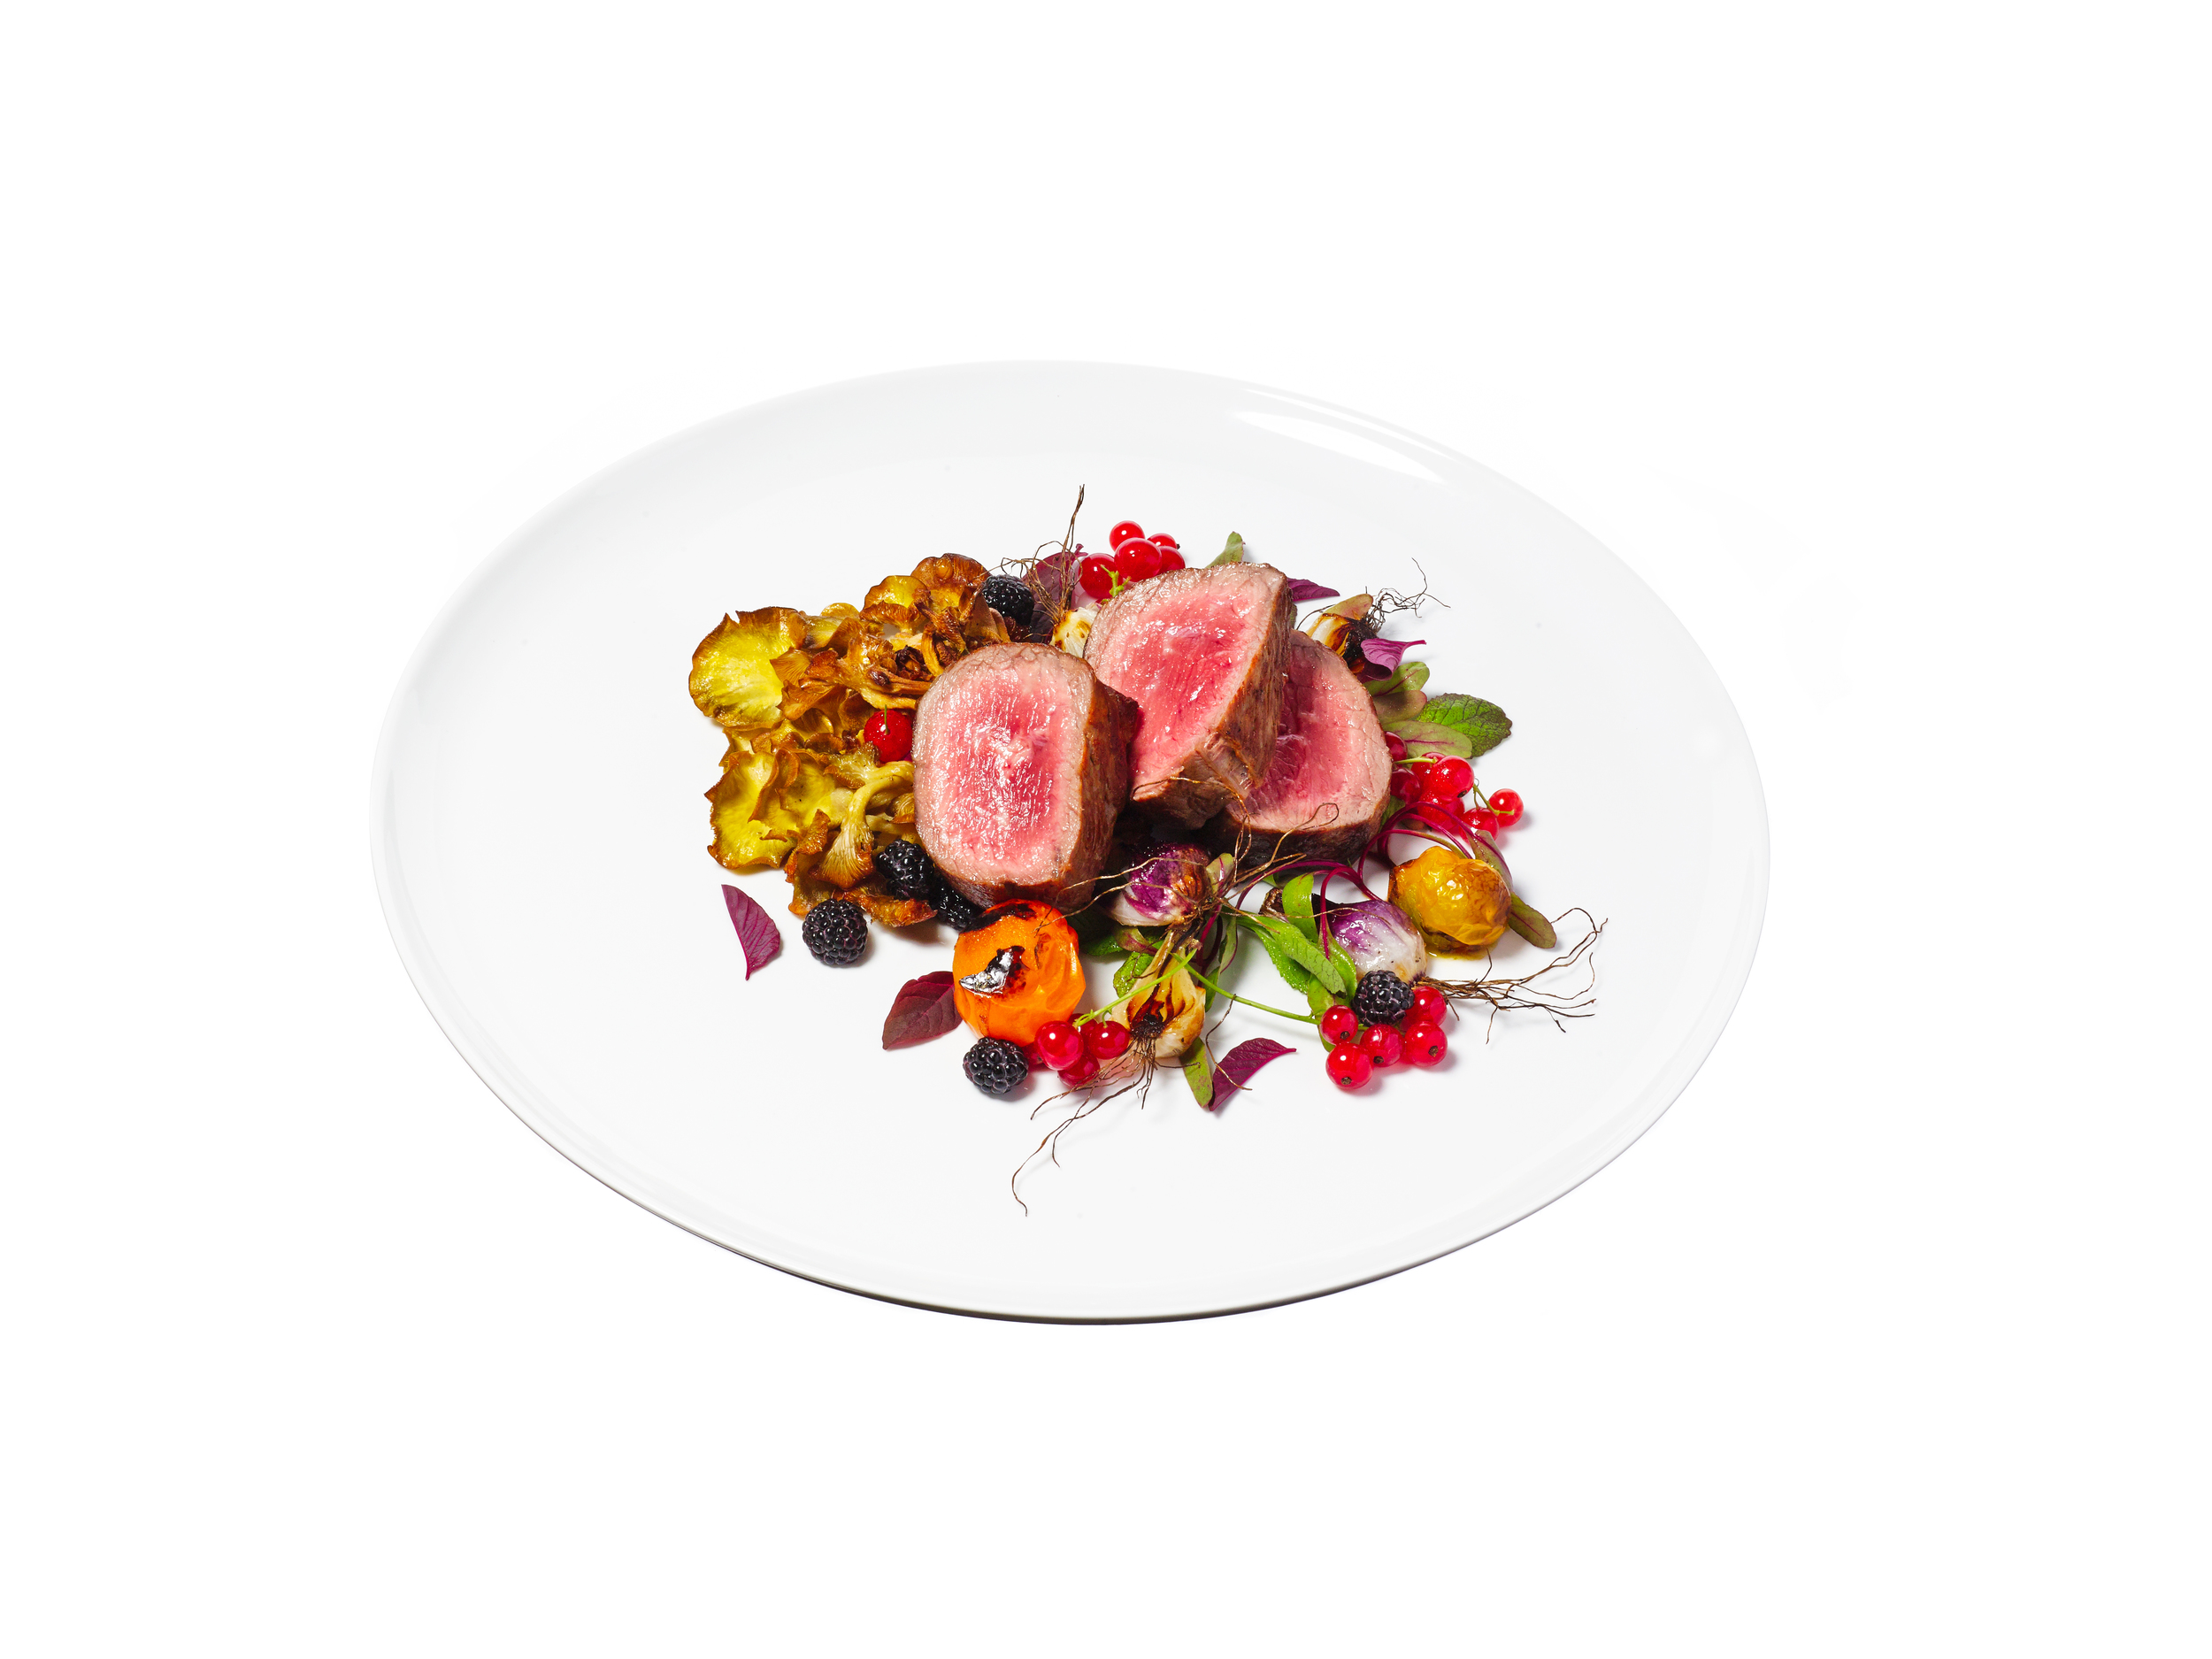 ribeye + artichoke